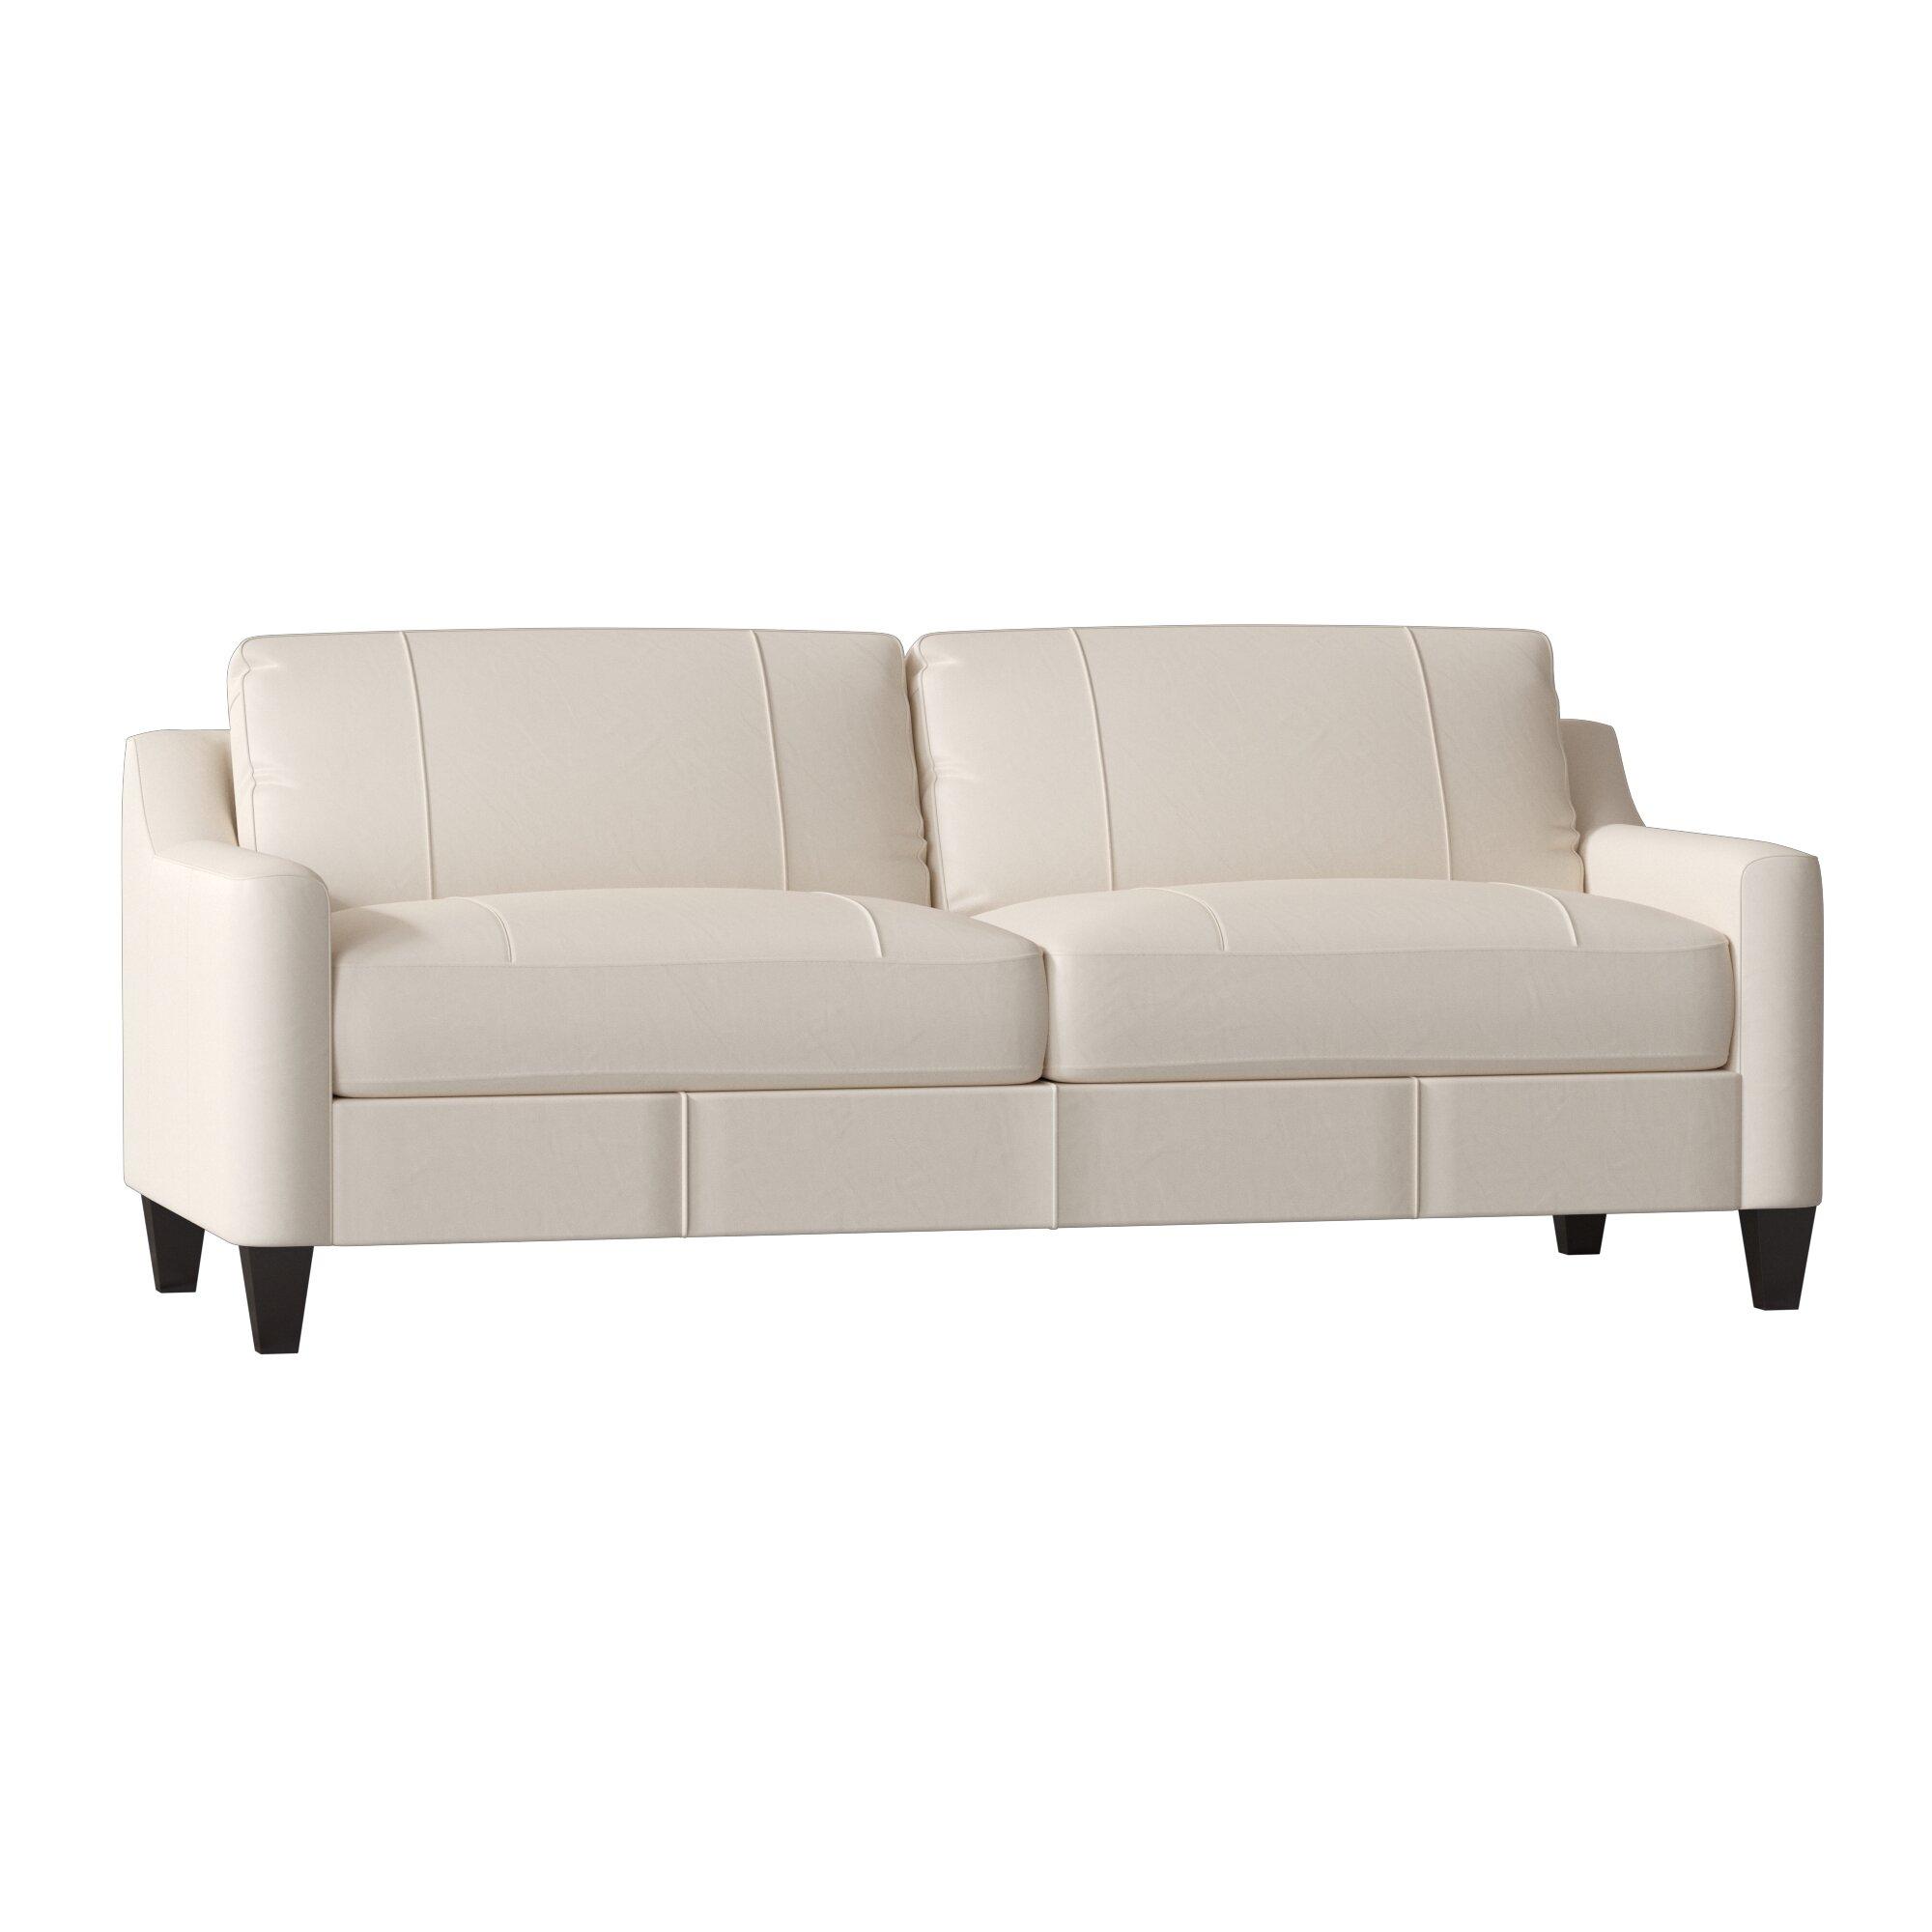 Super Jesper Leather Sofa Beatyapartments Chair Design Images Beatyapartmentscom